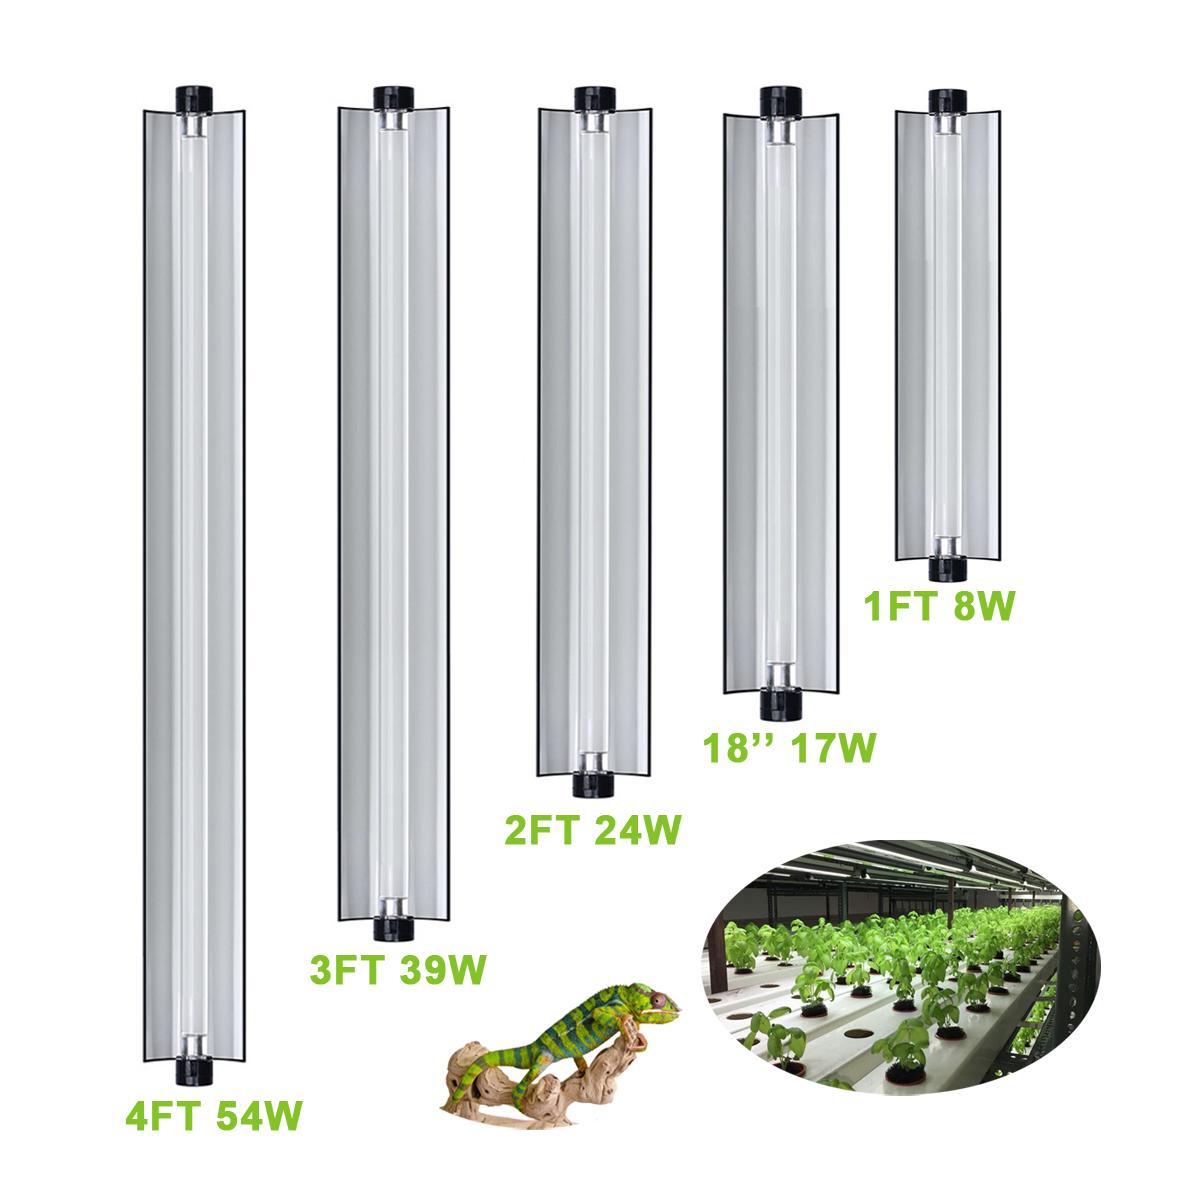 Plant Growth Lamp T5 Fluorescent Reflector Nanotech 24 Inch Edj Watts Grow Light Hydroponic Planter